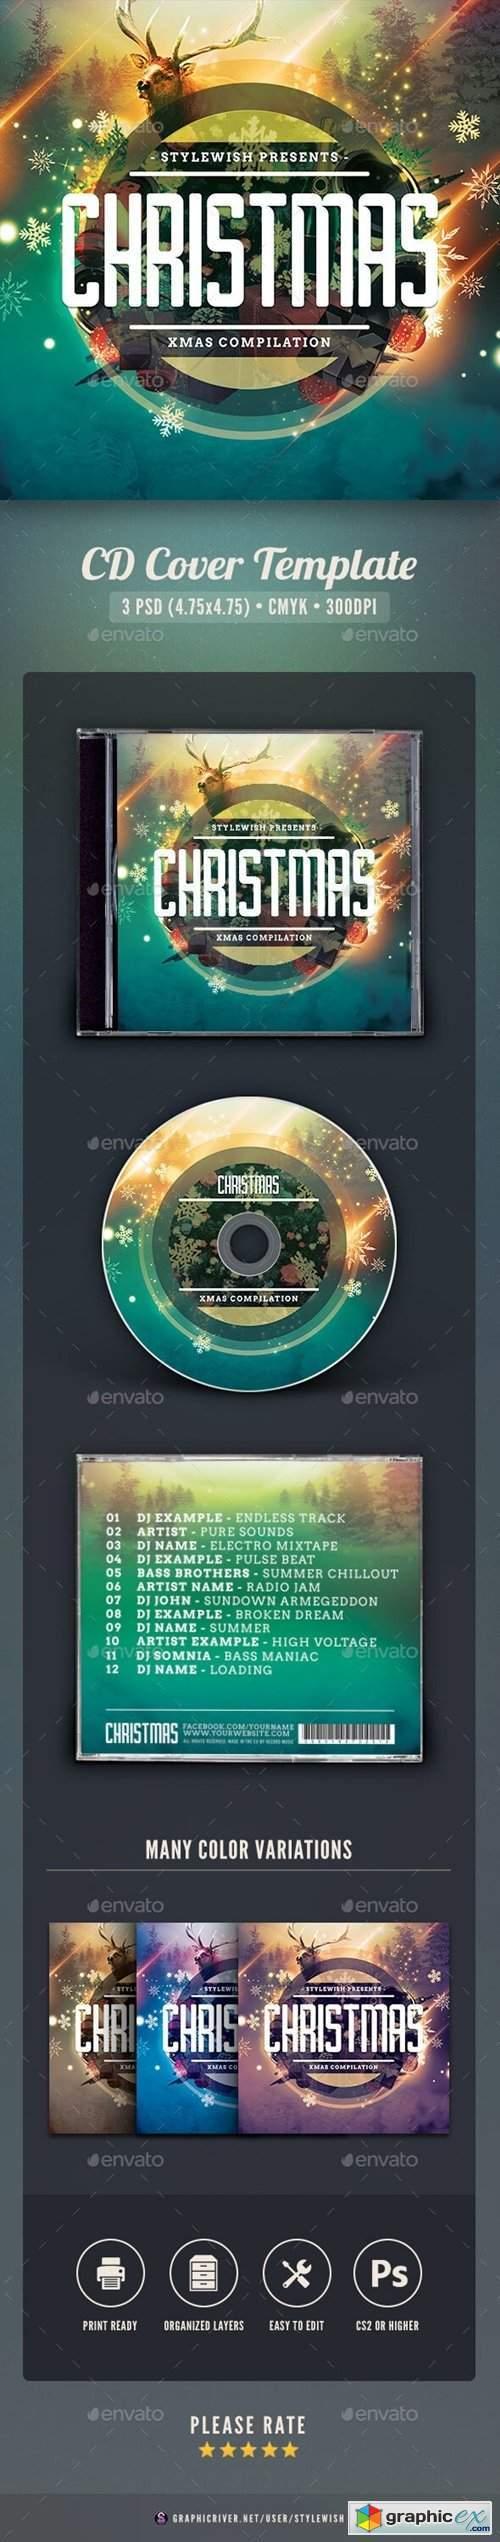 Christmas CD Cover Artwork